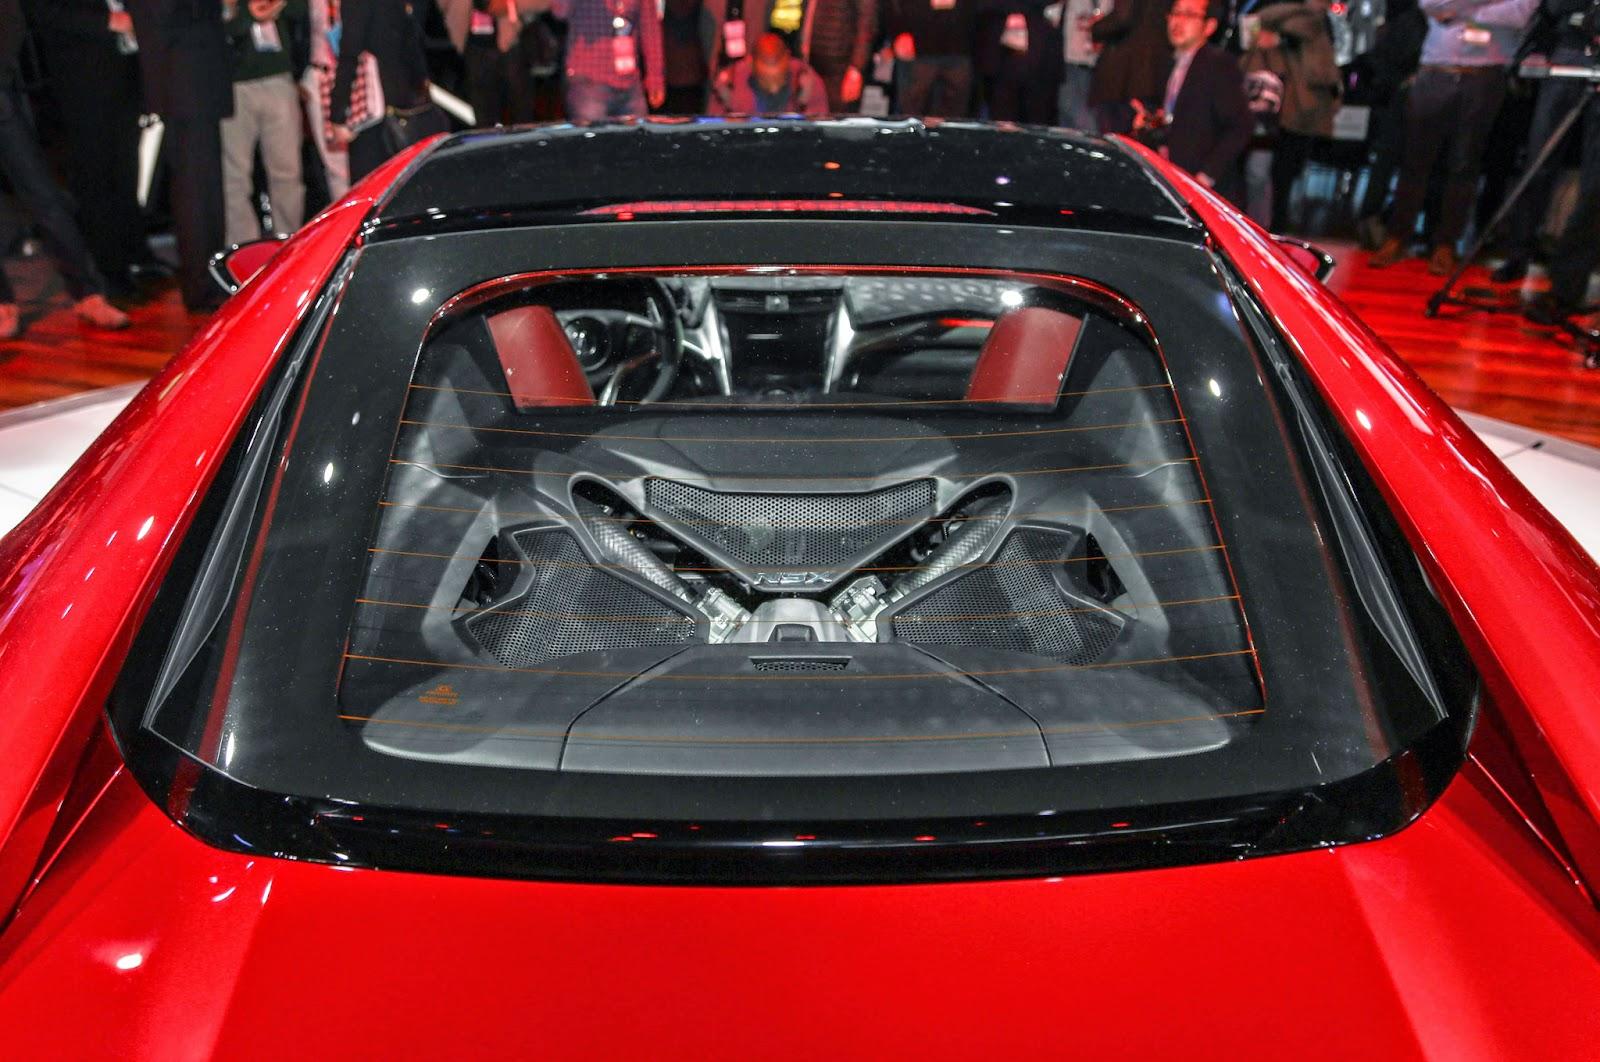 2016 Acura NSX Horsepower